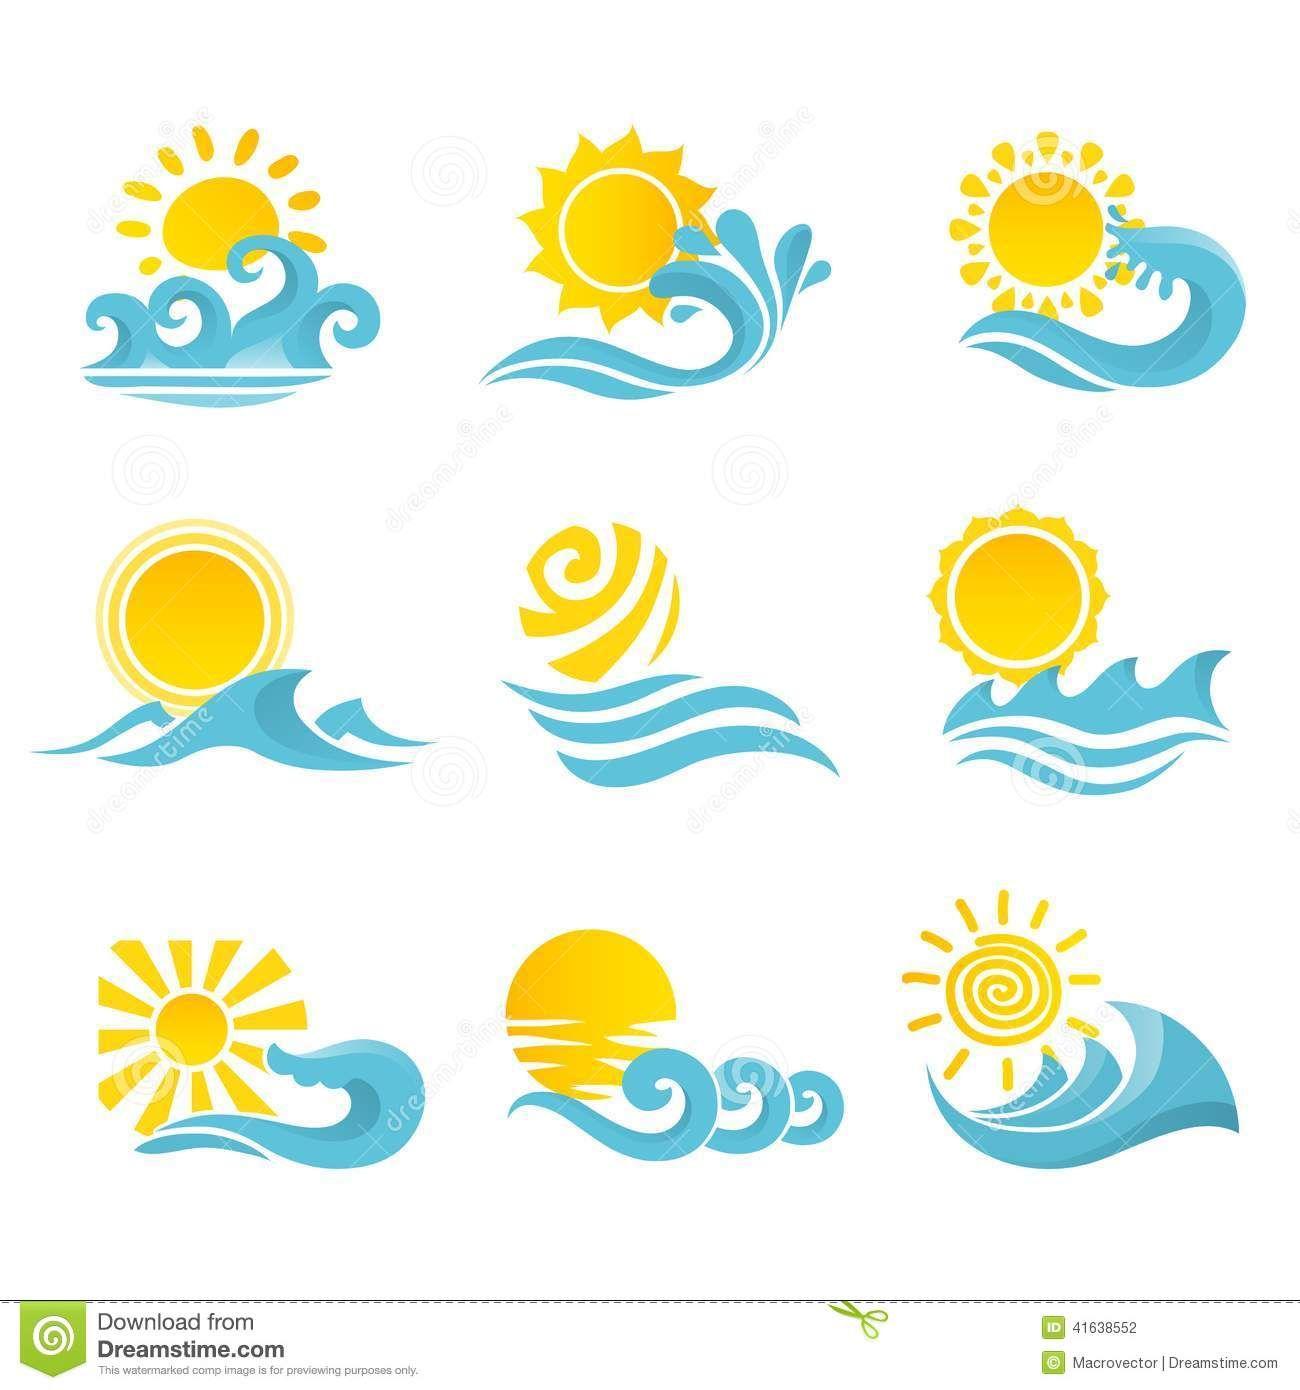 sun wave art Google Search Sun art, Surfboard painting